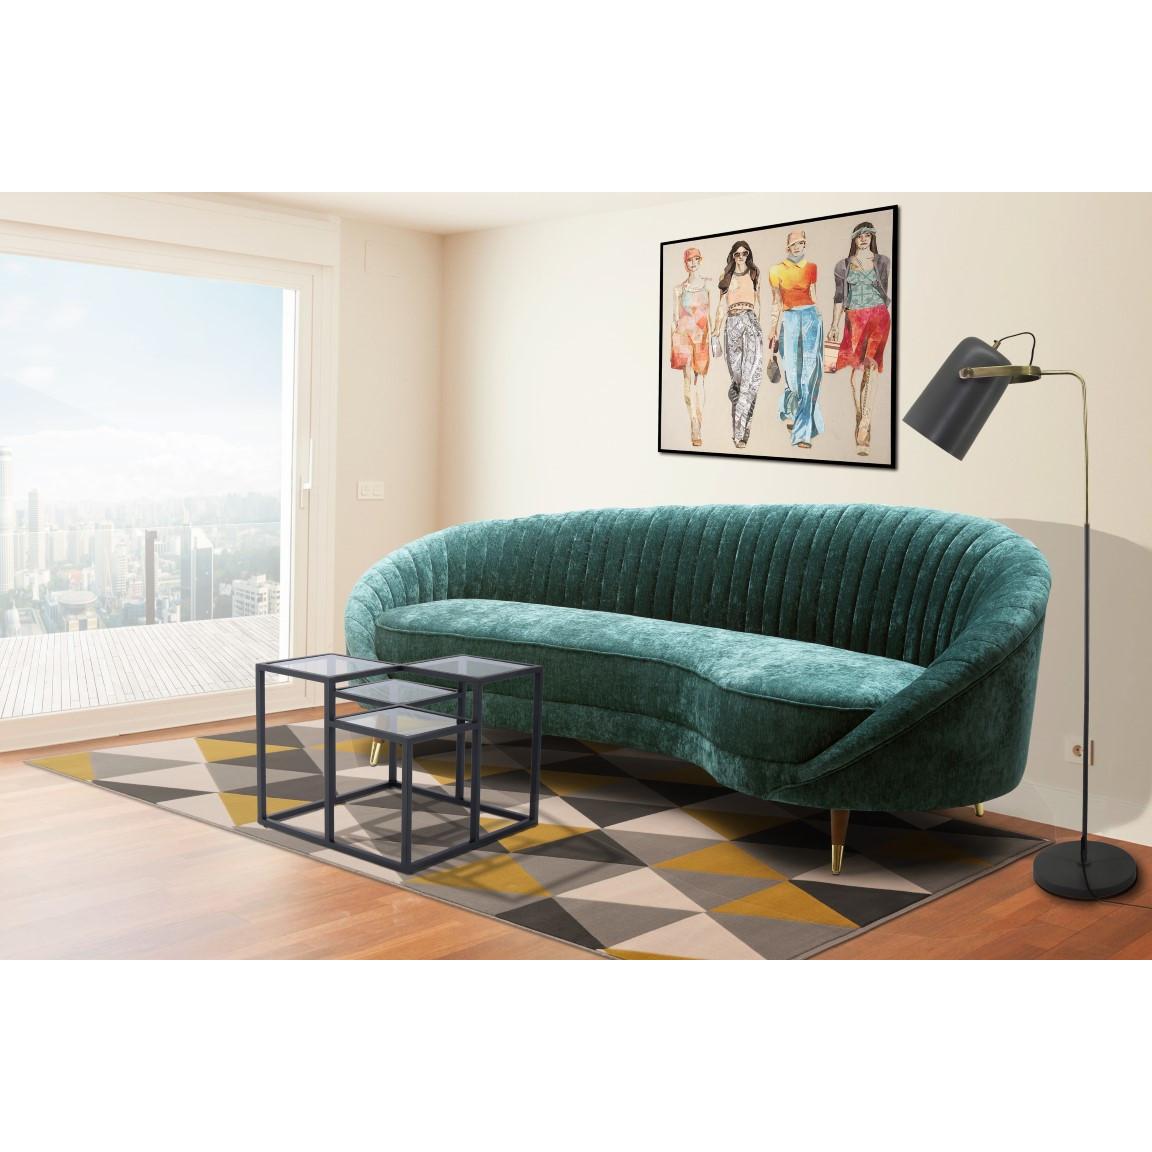 3-Sitzer-Sofa Caesar 333 | Benzinblau